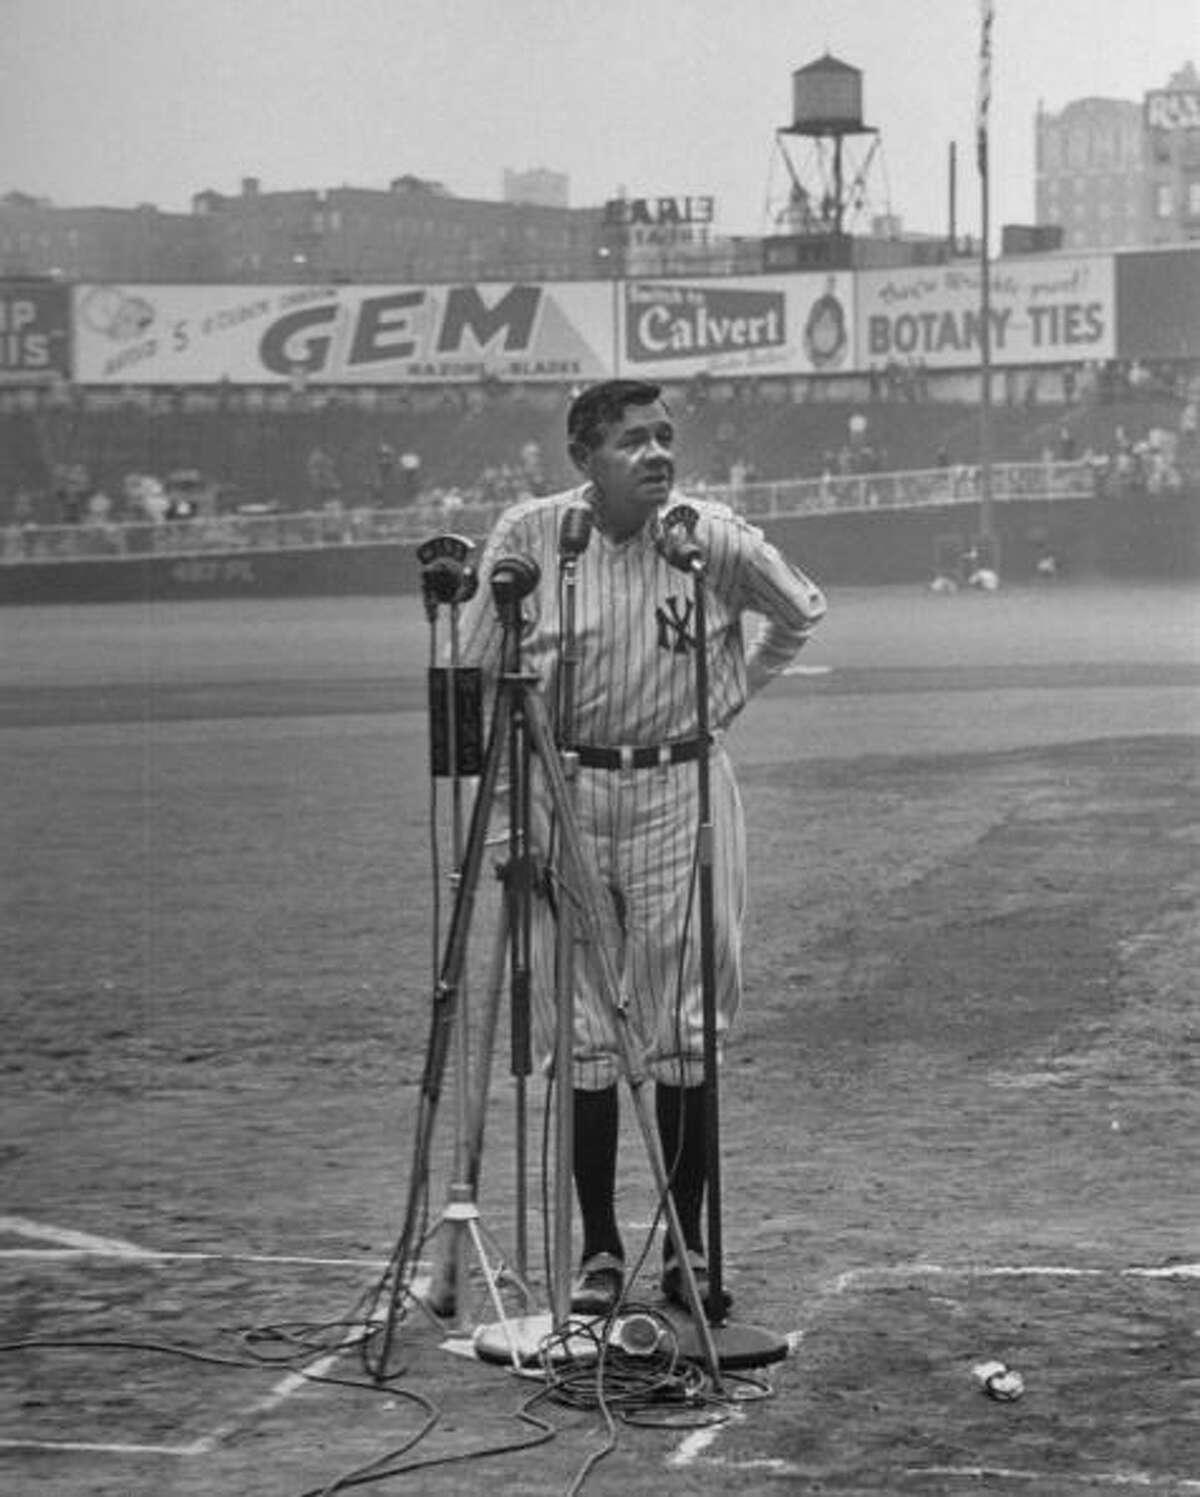 Babe Ruth at New York Yankees' 25th Anniversary.